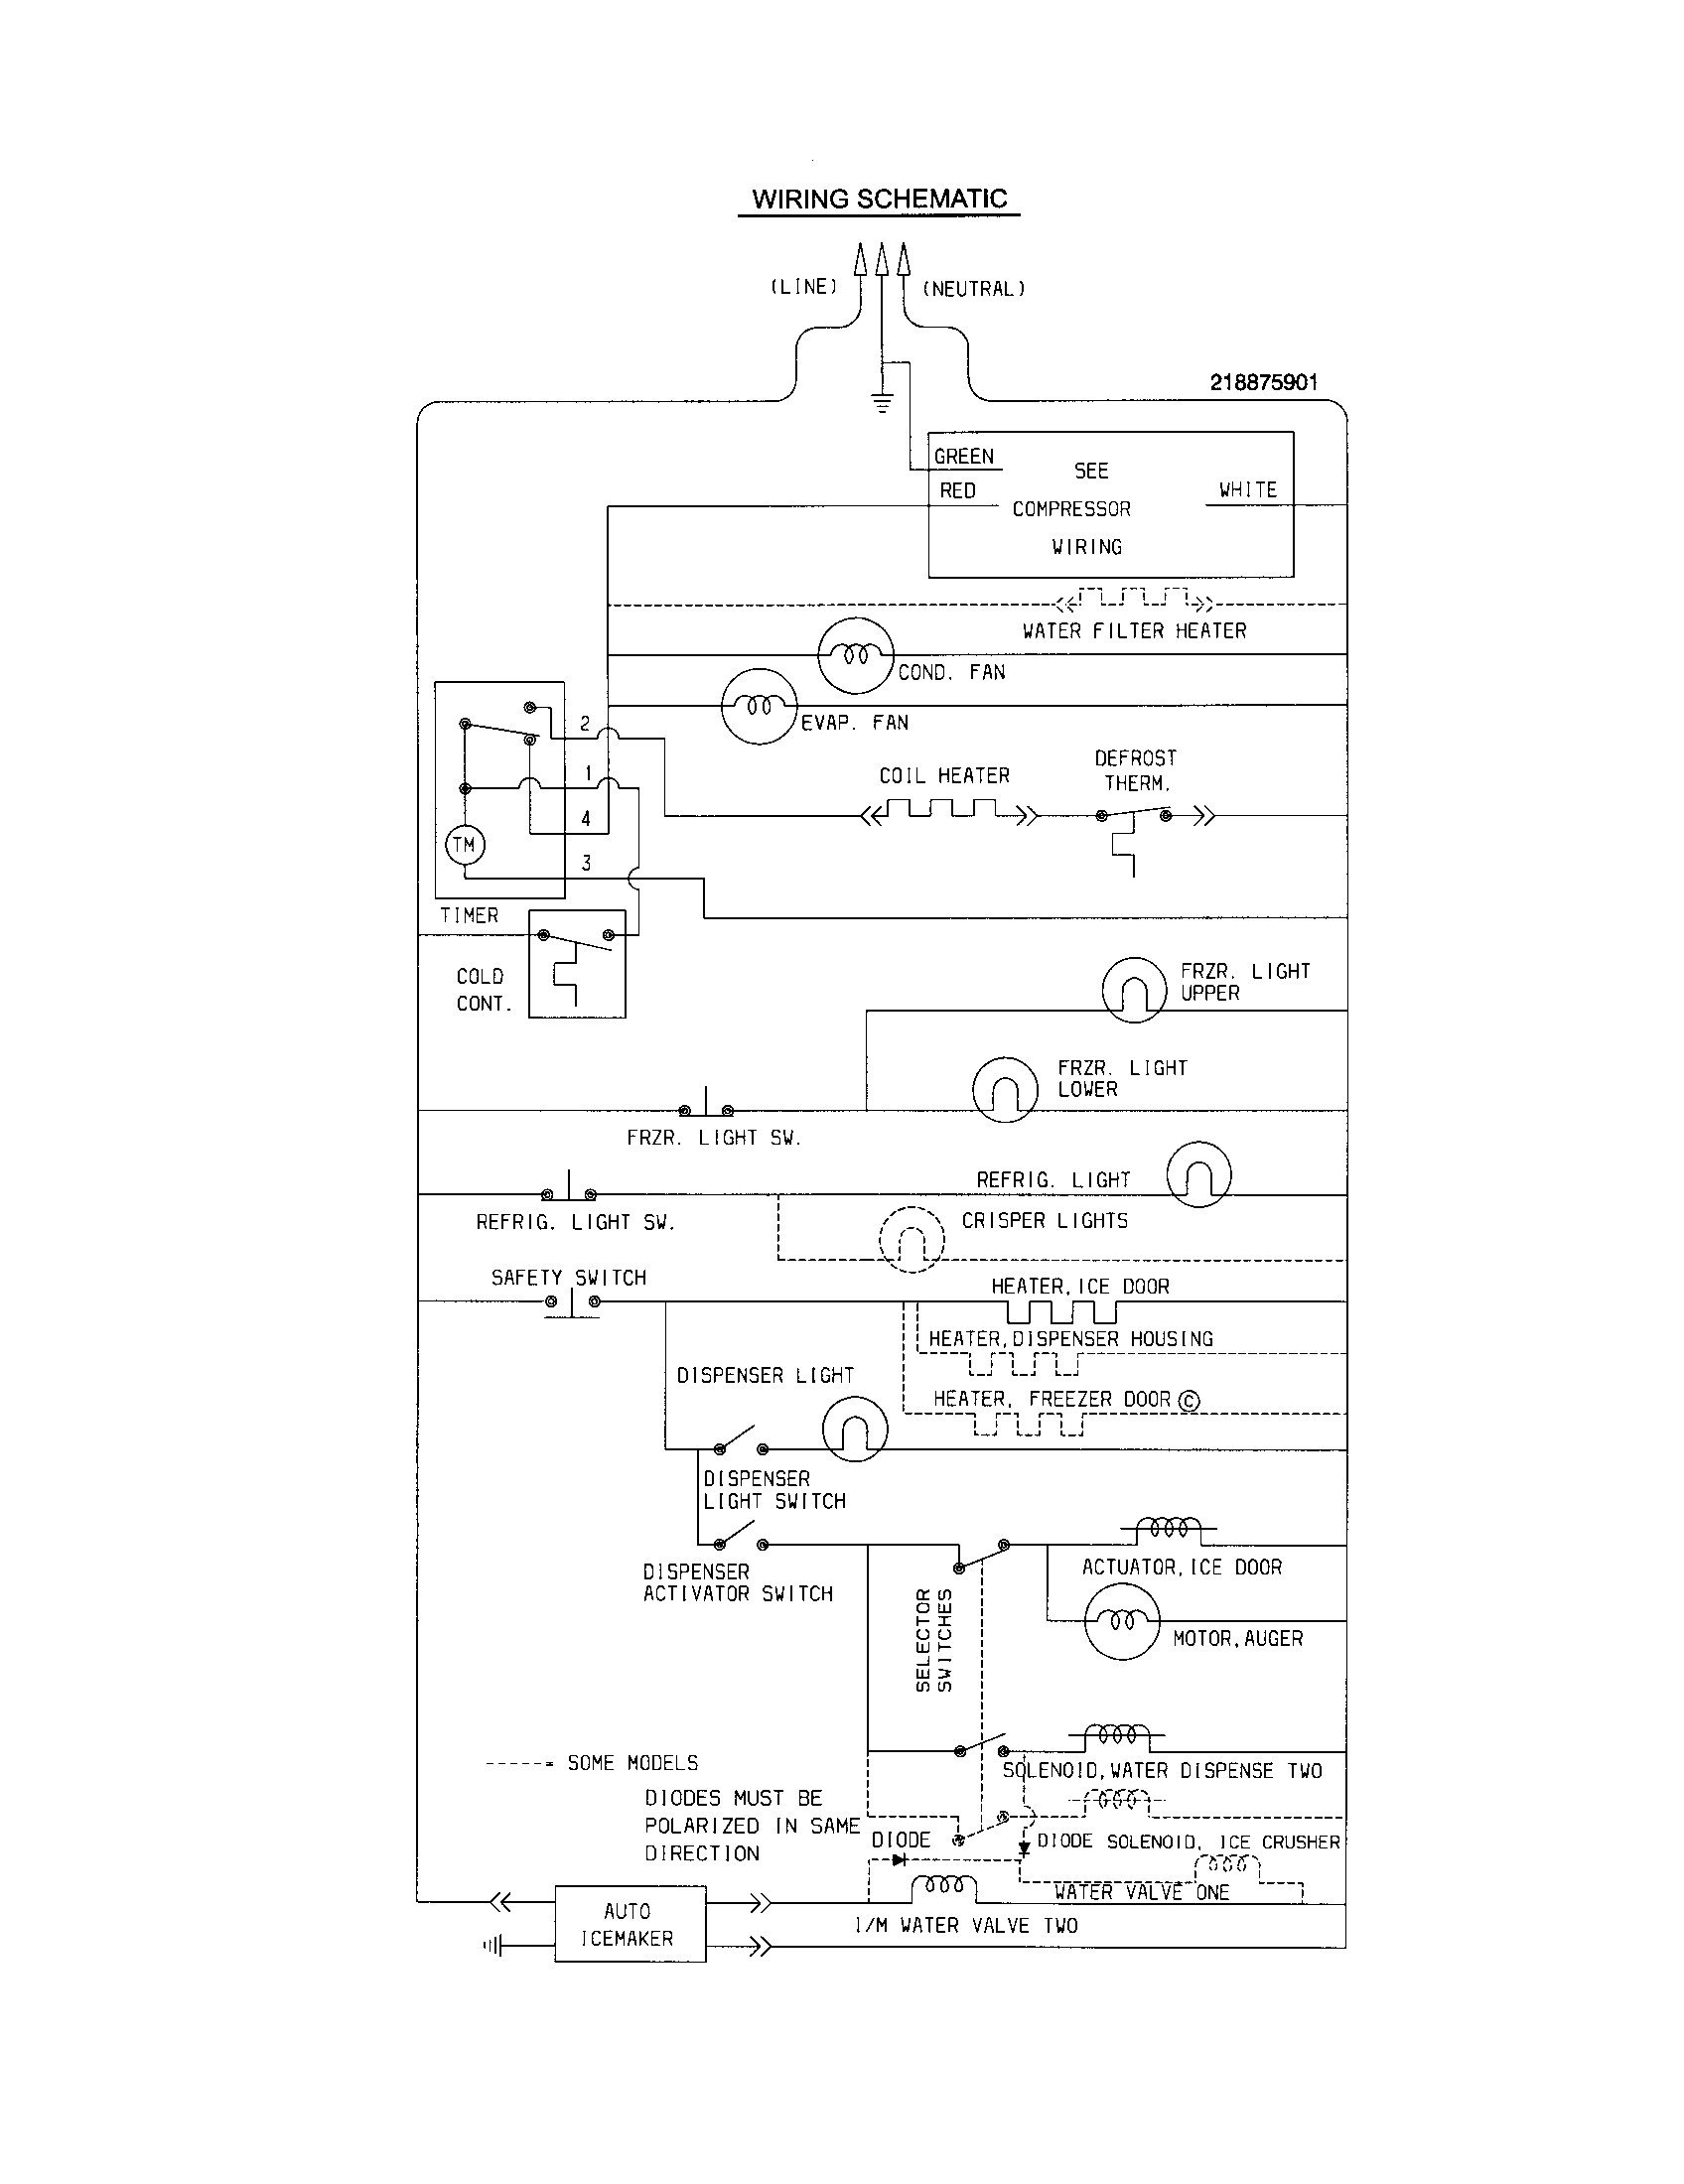 frigidaire refrigerator wiring diagram collection wiring diagram rh faceitsalon com Frigidaire Wiring Schematics Frigidaire Parts Diagrams